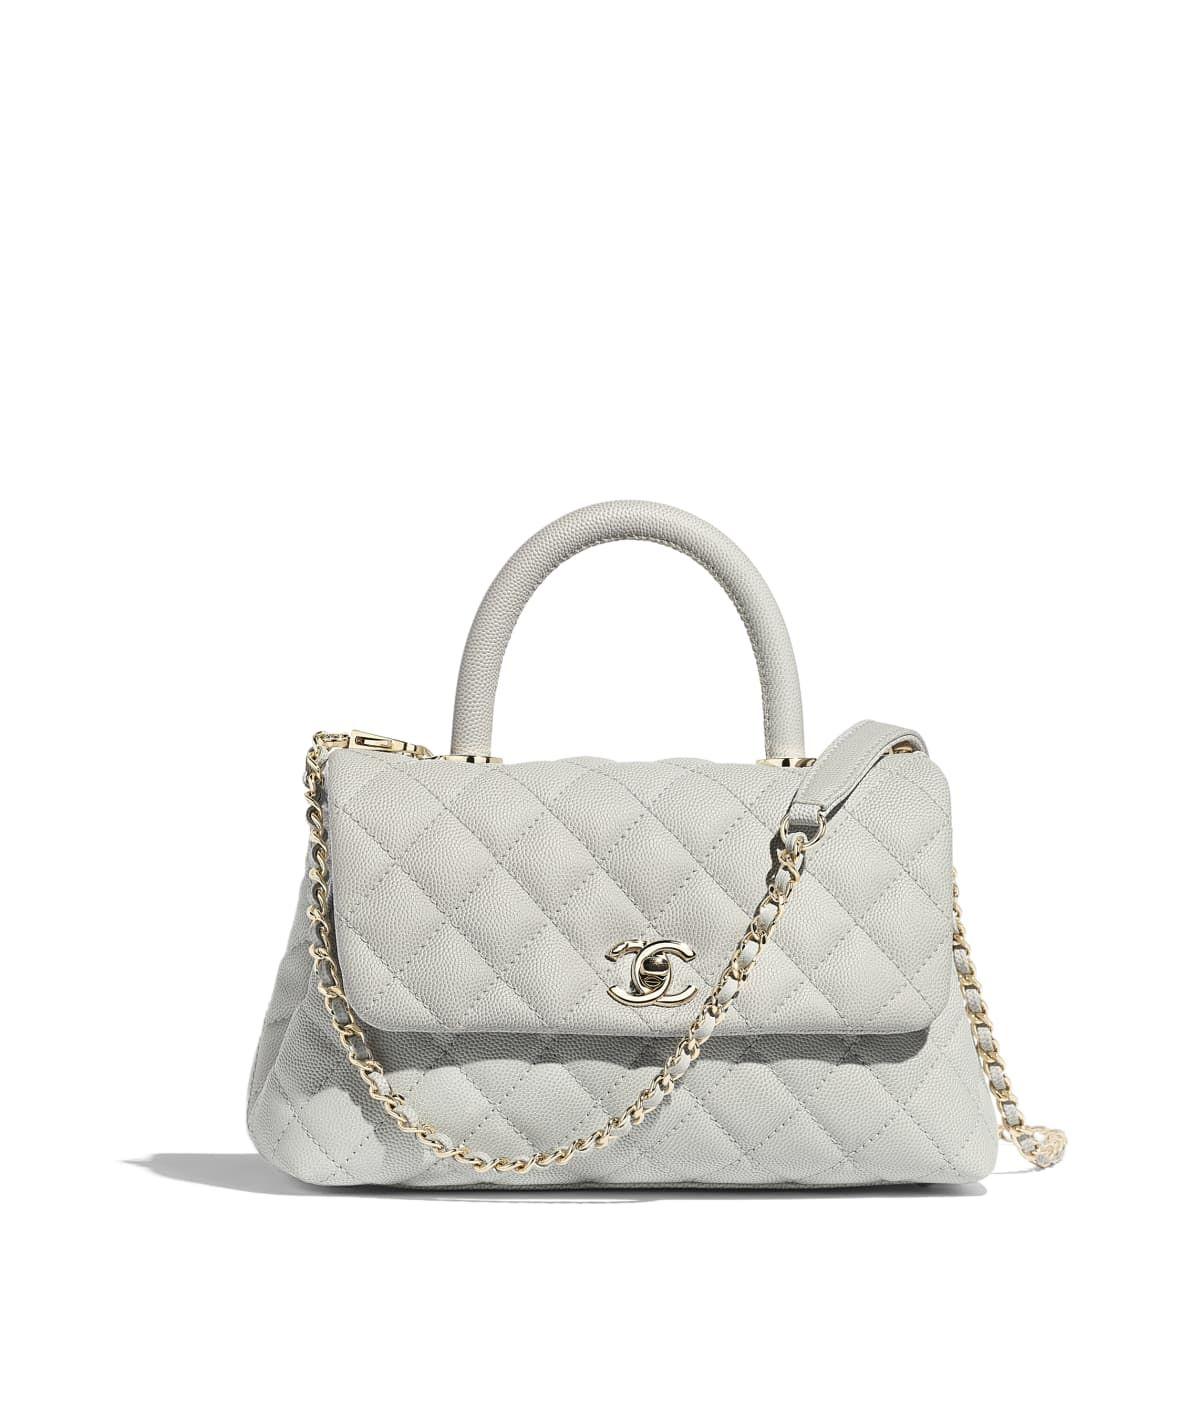 d64a7c7badbf Small Flap Bag With Top Handle